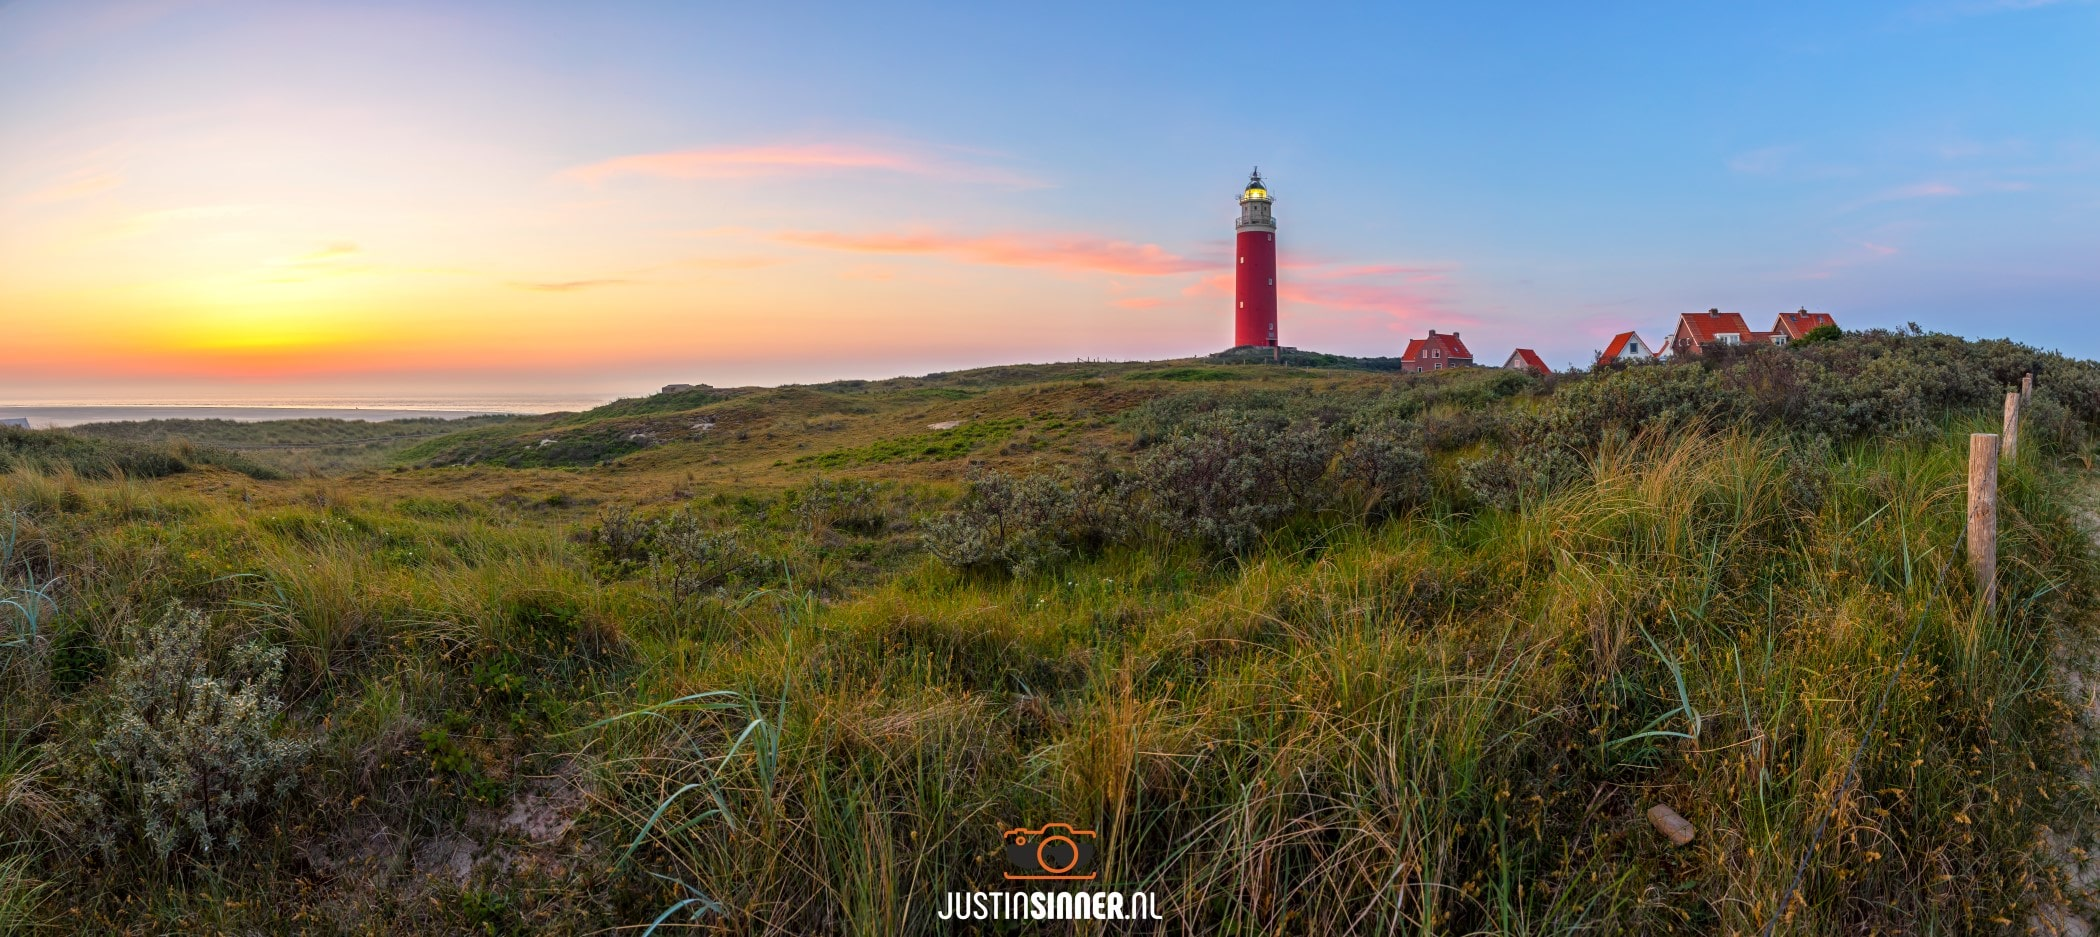 Vuurtoren van Texel tijdens een schitterende zonsondergang / Texel lighthouse during a stunning sunset